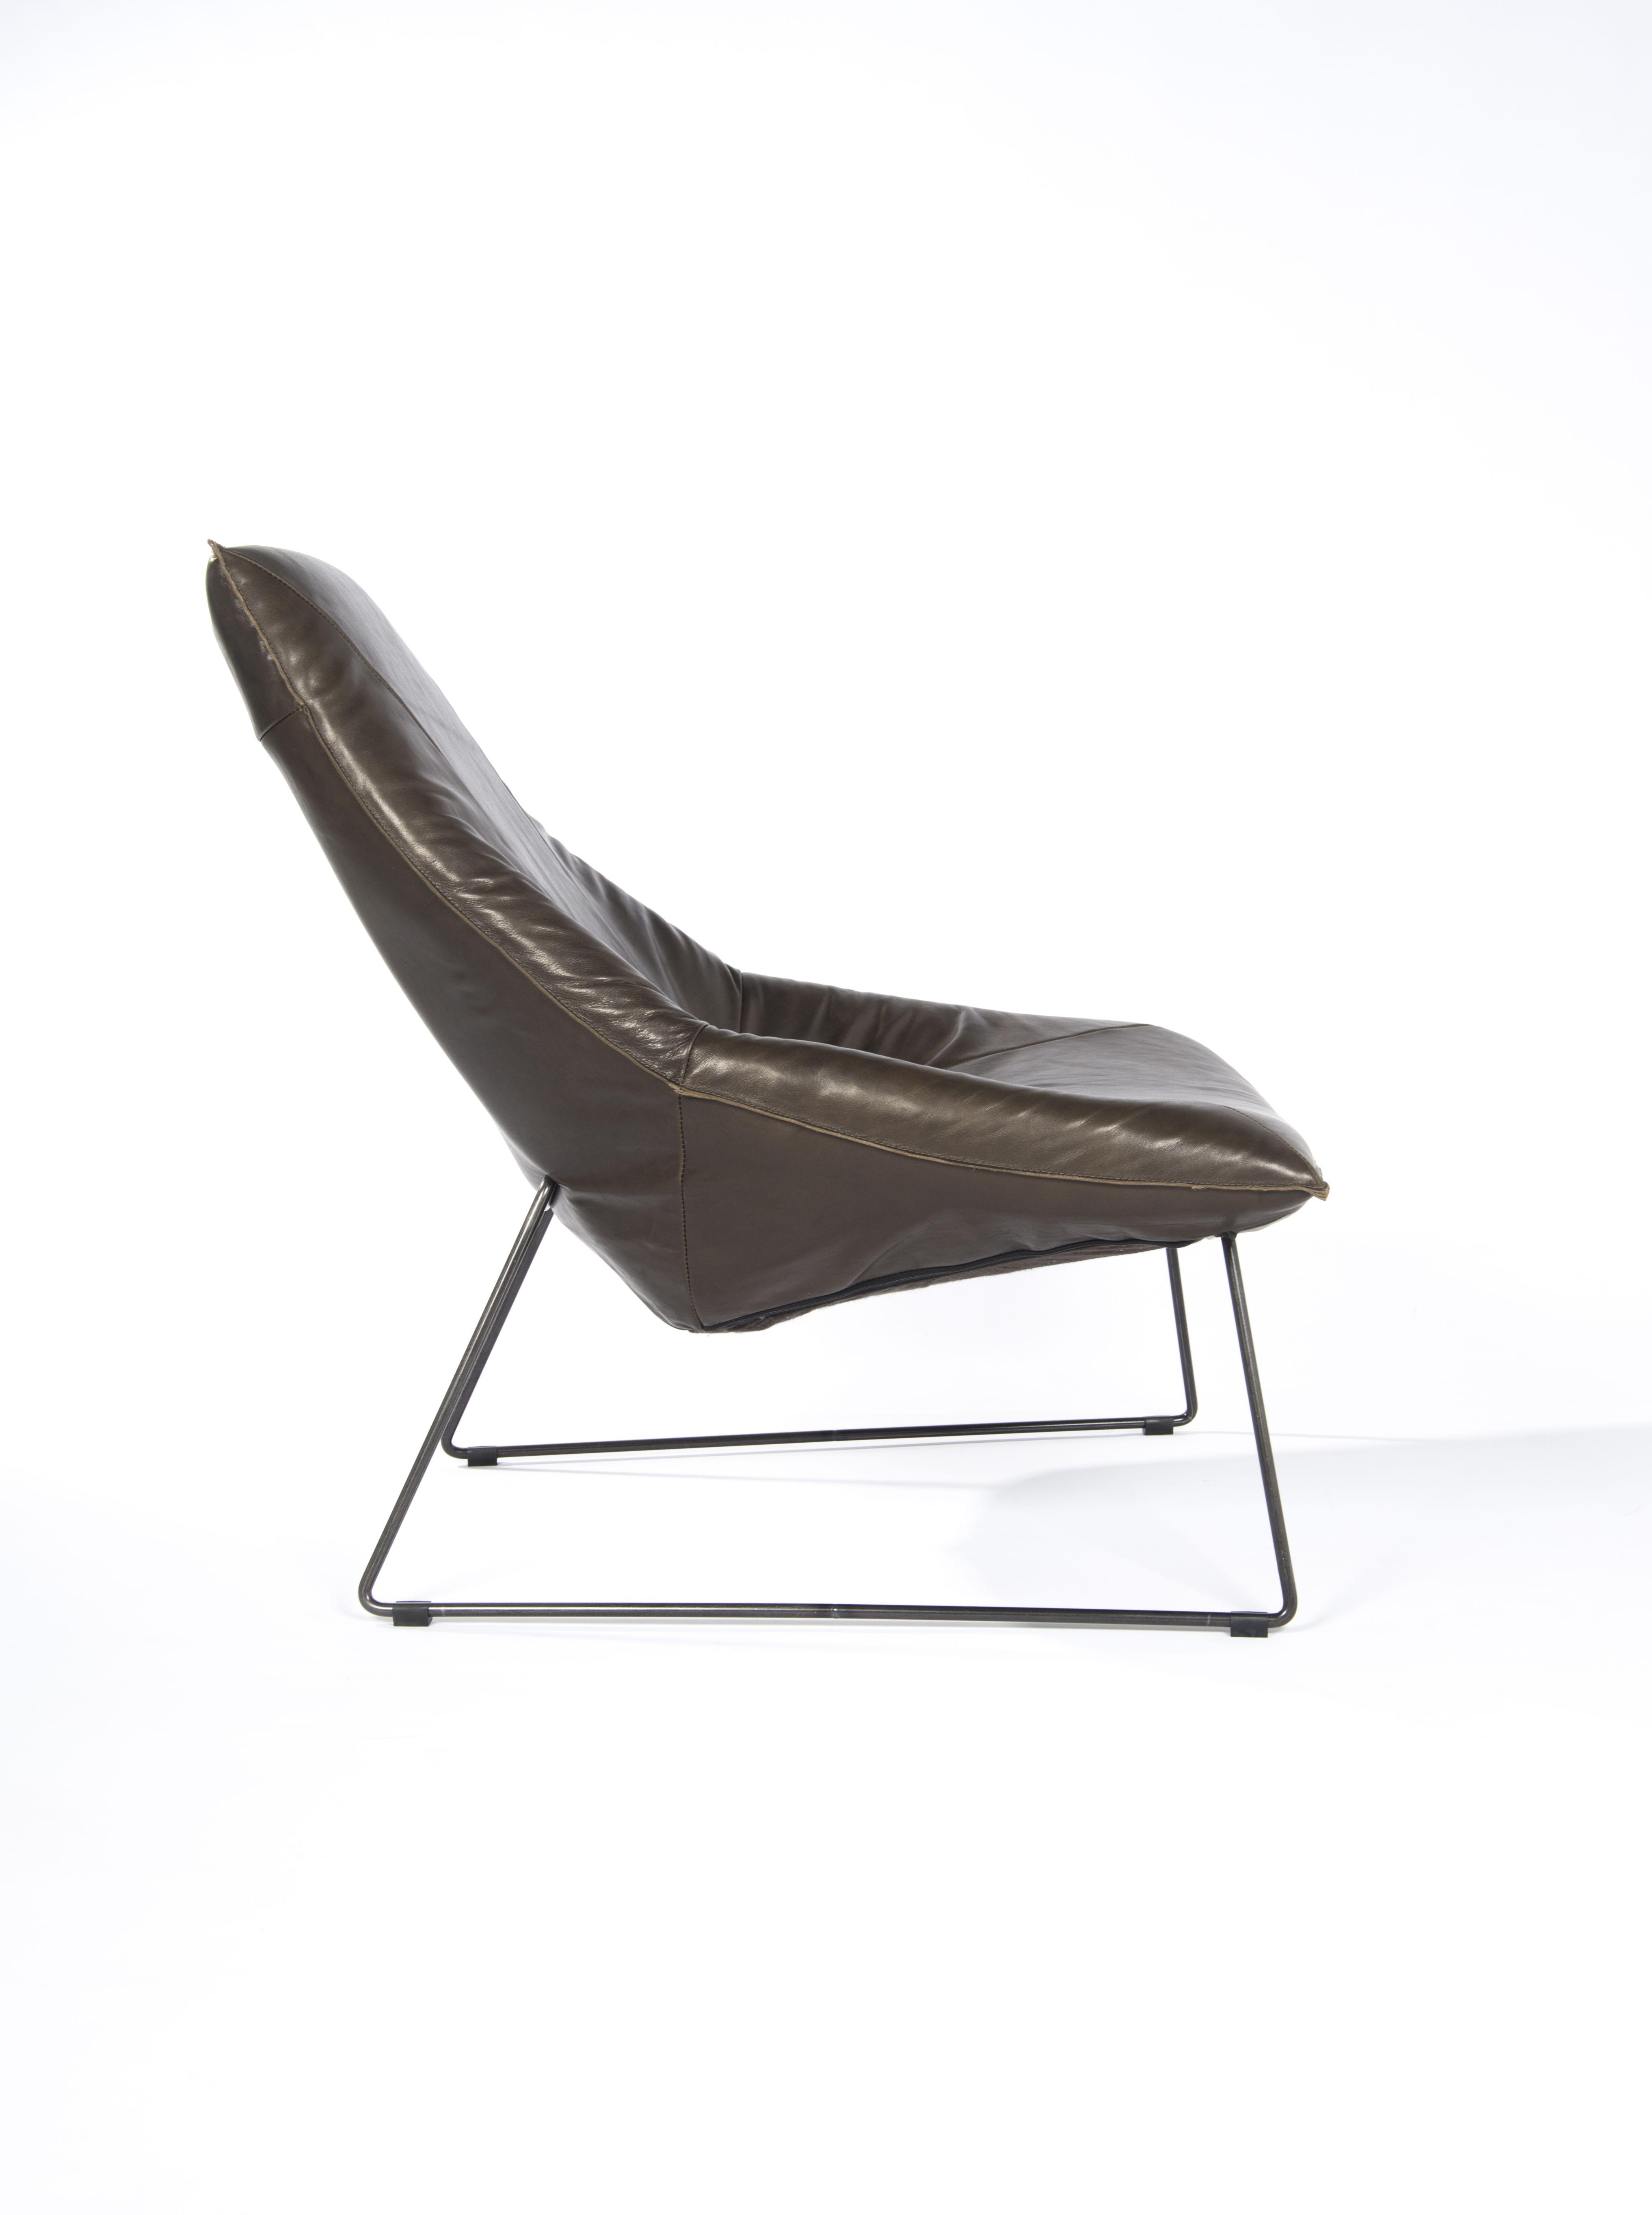 Peachy Neal Chair In Luxor Grey With 12 Mm Old Glory Frame Jess Creativecarmelina Interior Chair Design Creativecarmelinacom